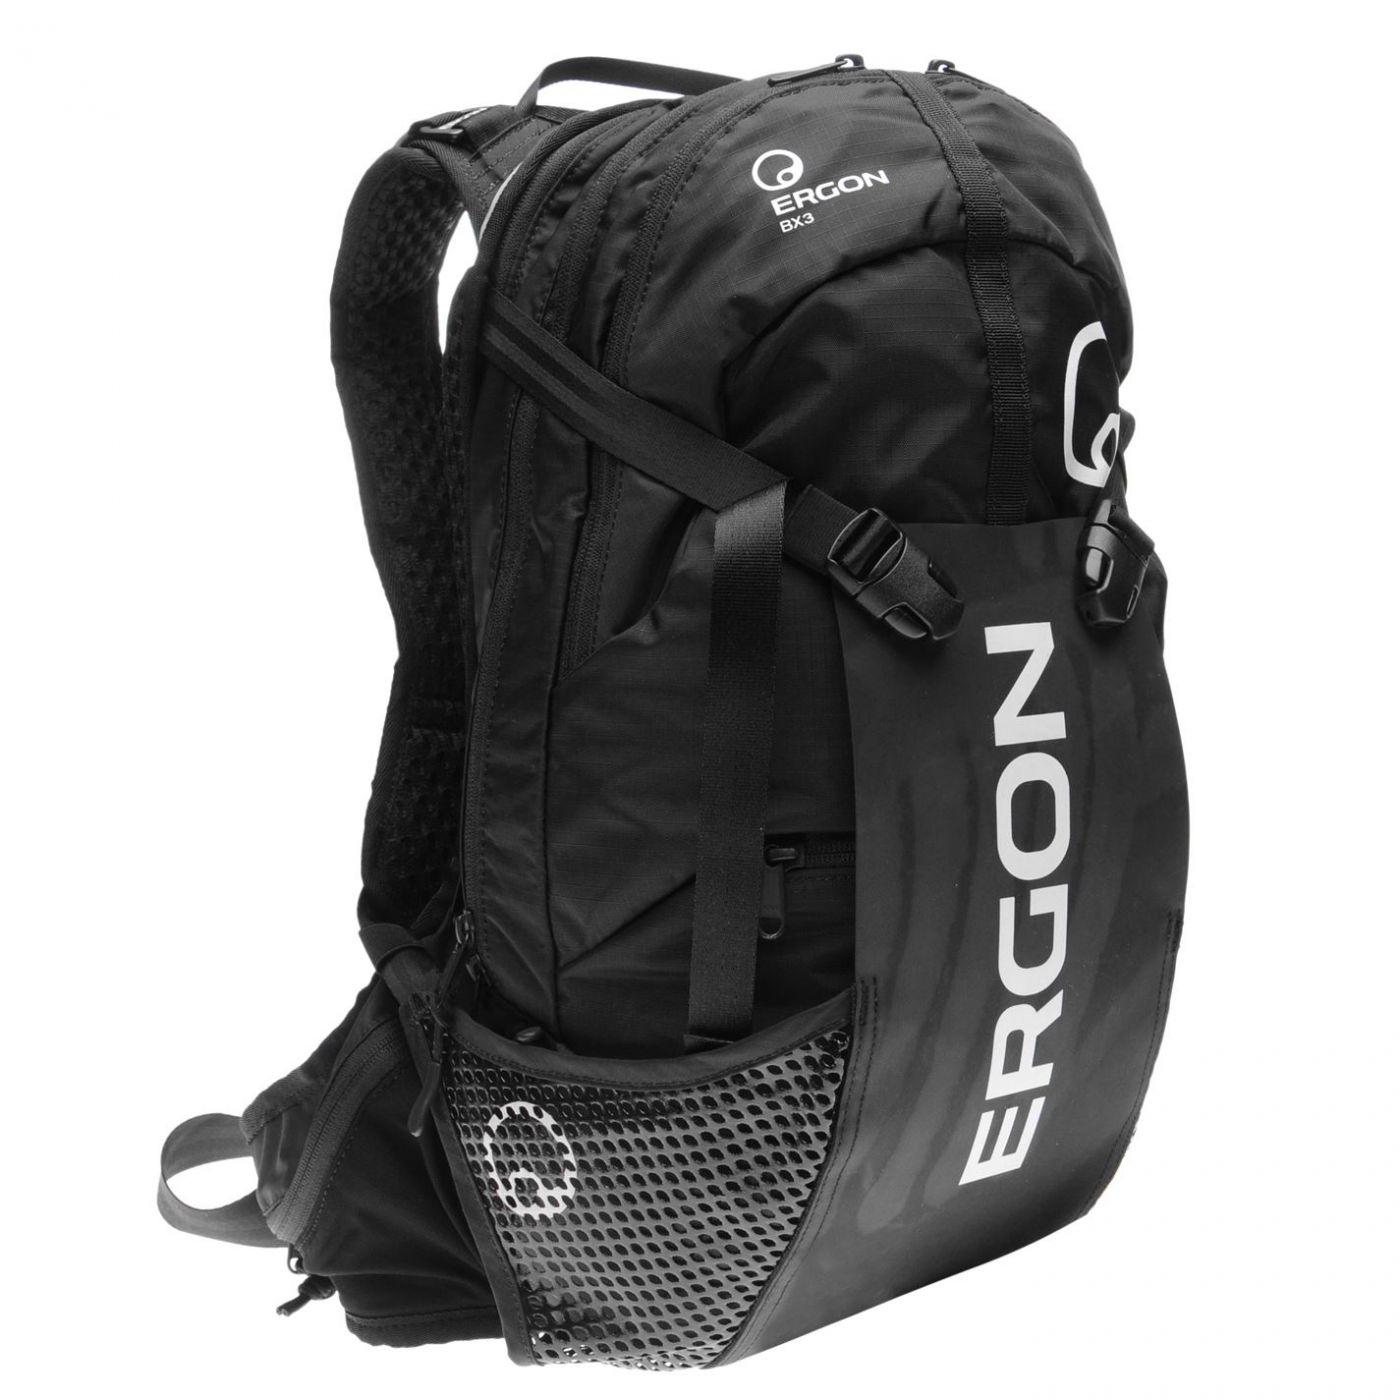 Ergon BX3 Hydration Marathon Backpack